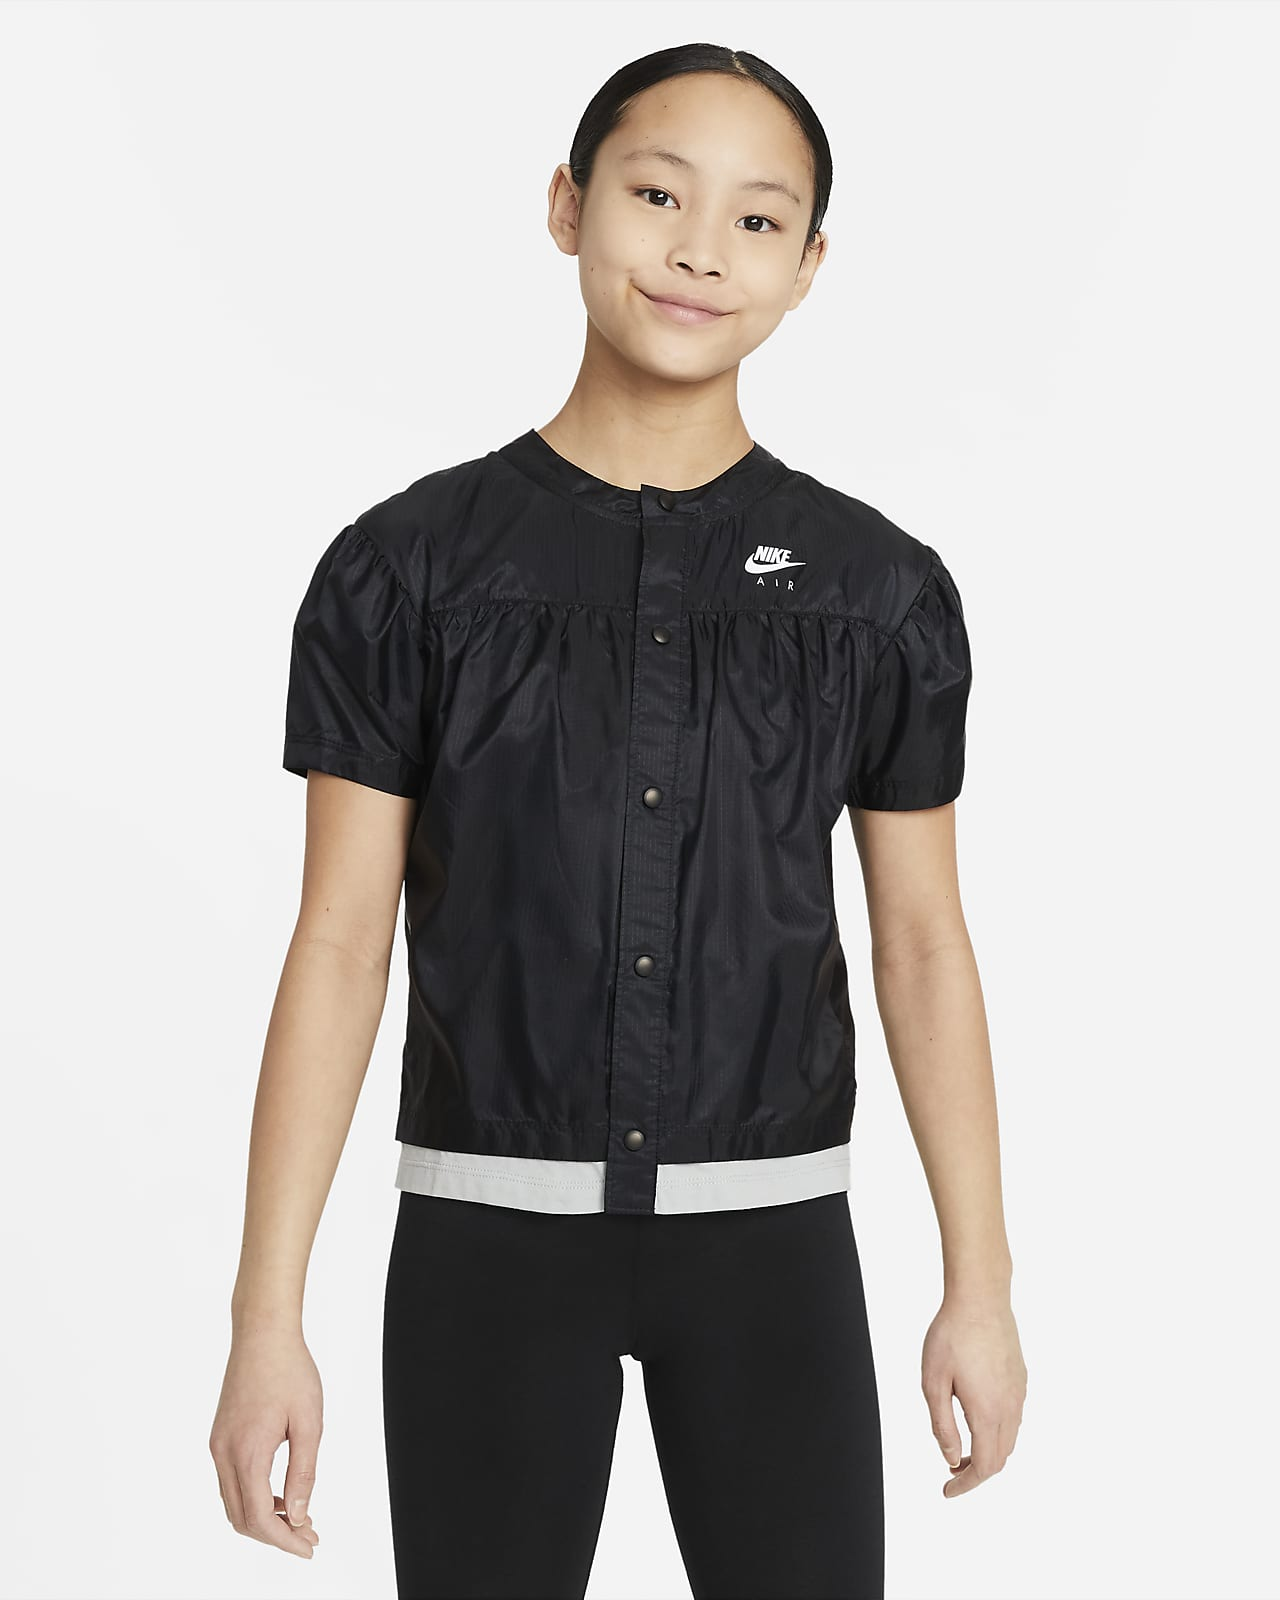 Nike Air Kısa Kollu Dokuma Genç Çocuk (Kız) Üstü